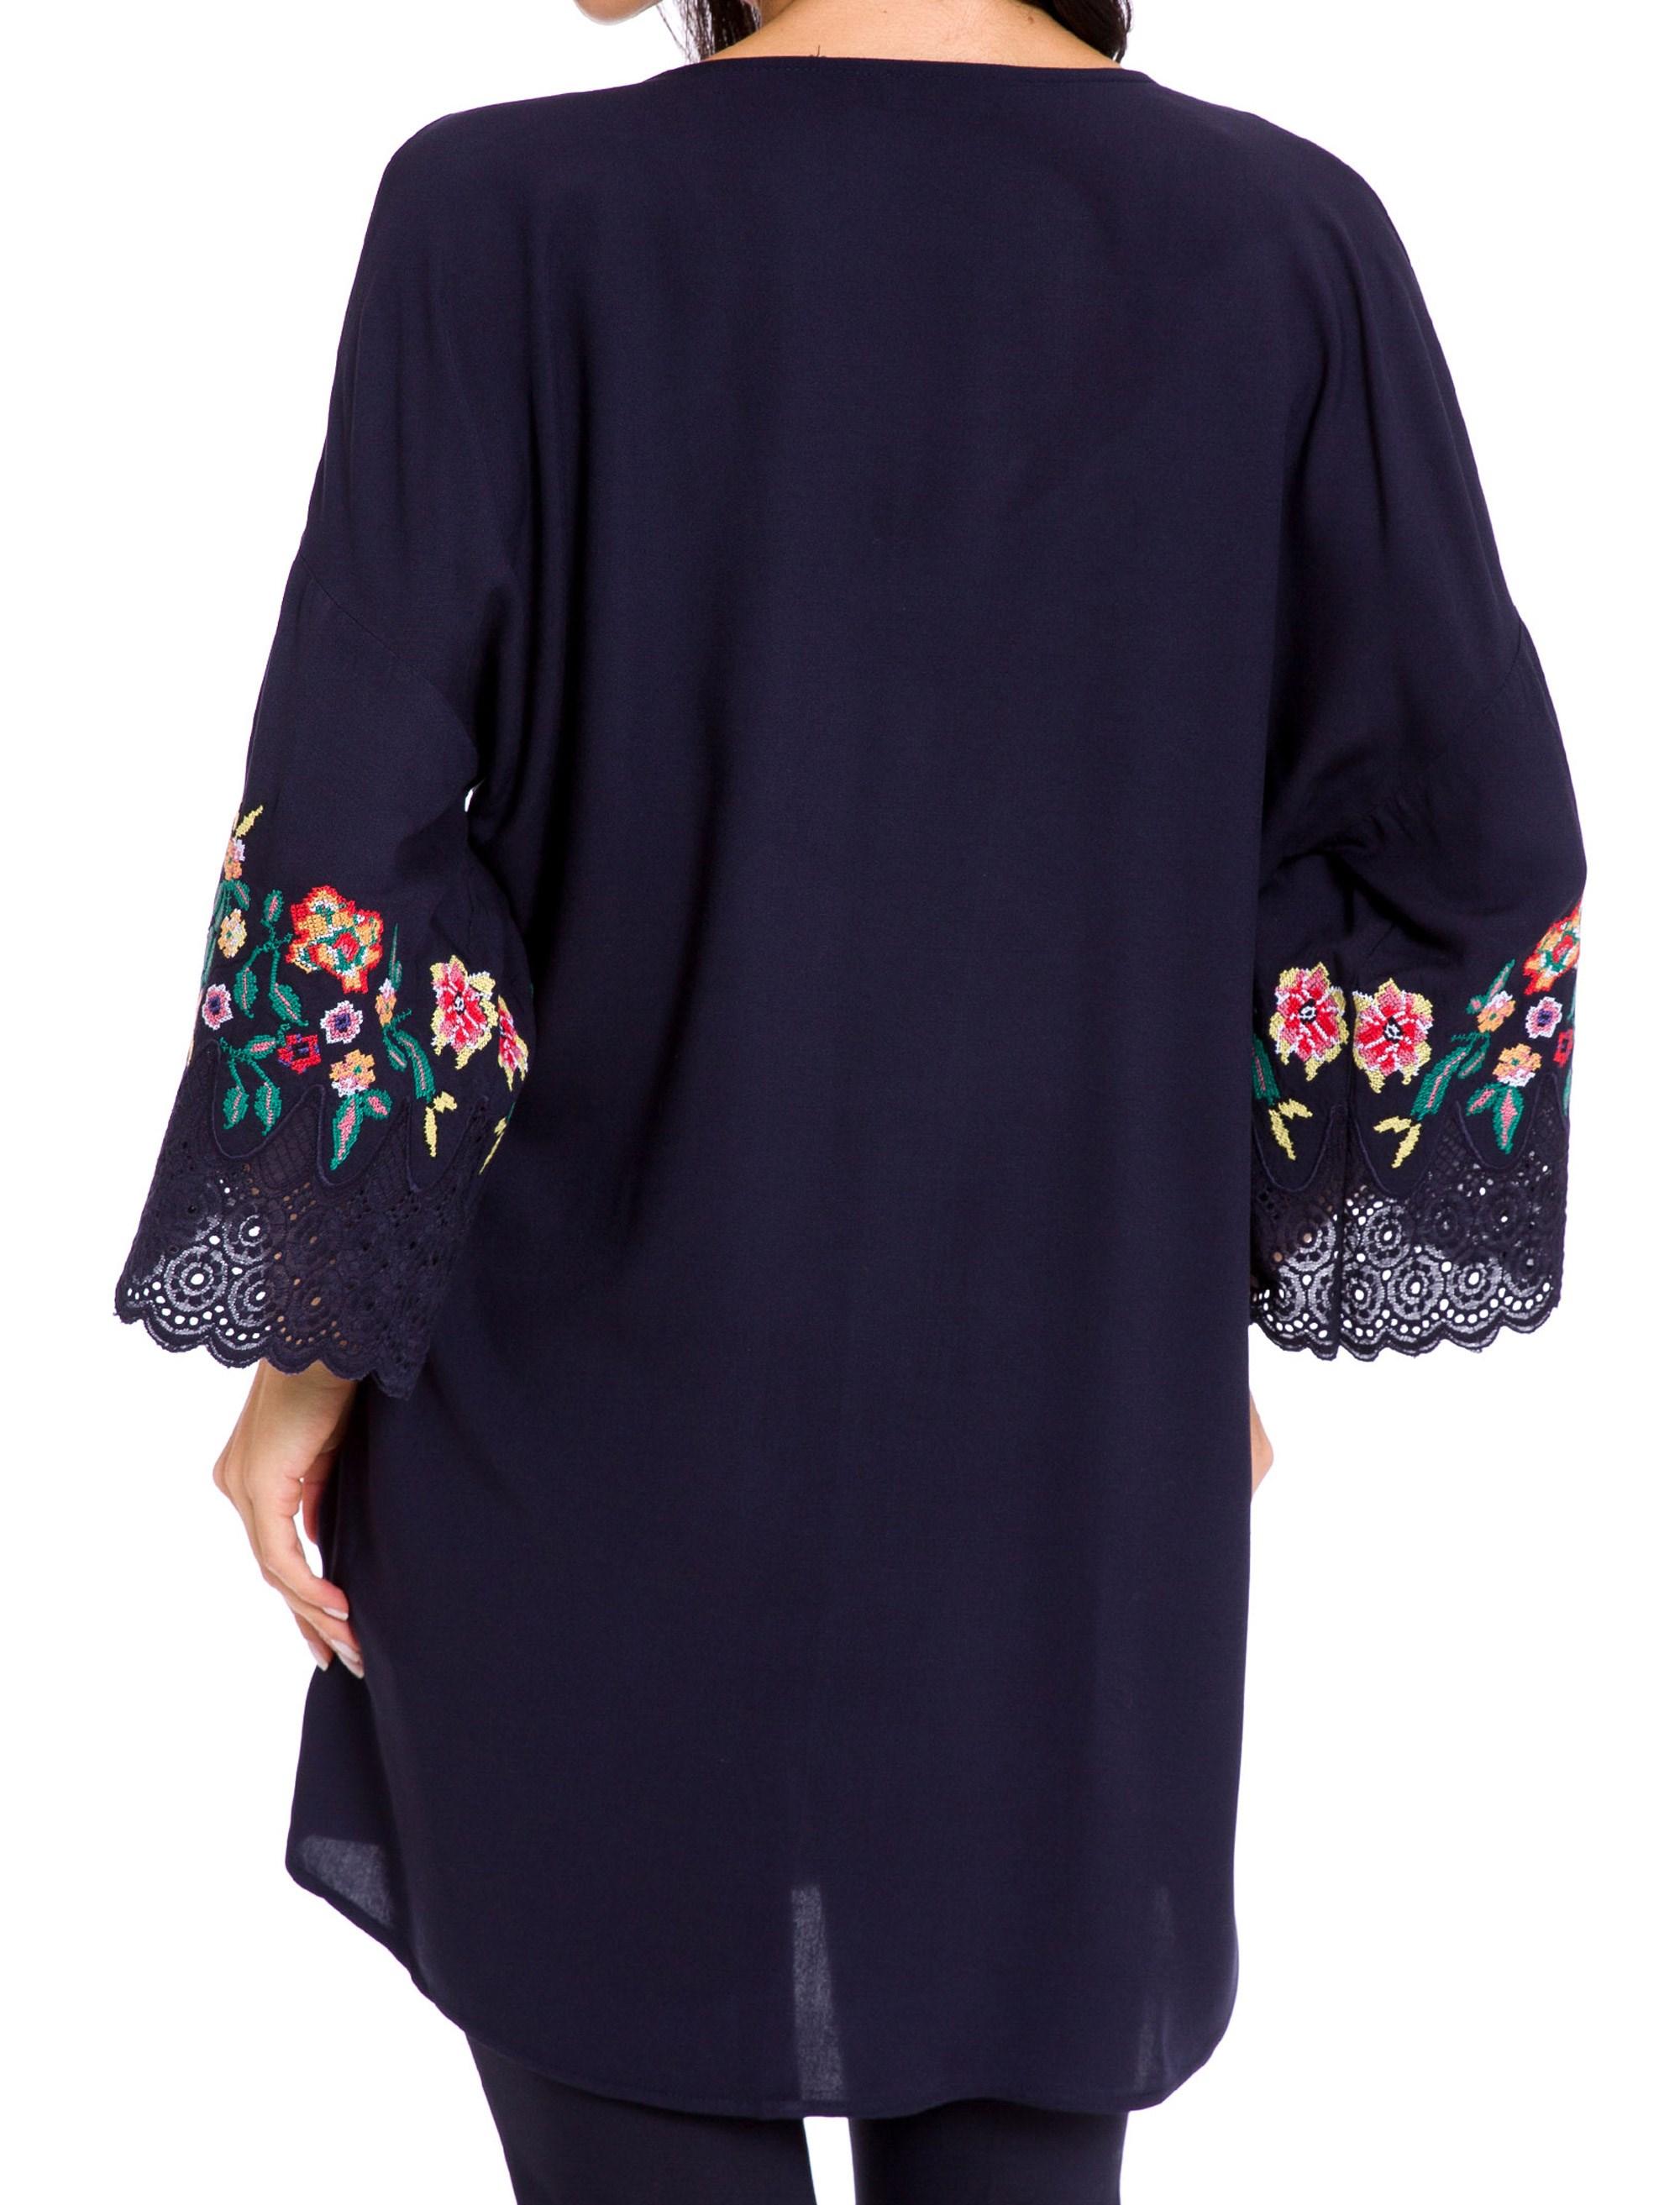 رویه لباس ویسکوز زنانه - سرمه اي  - 2